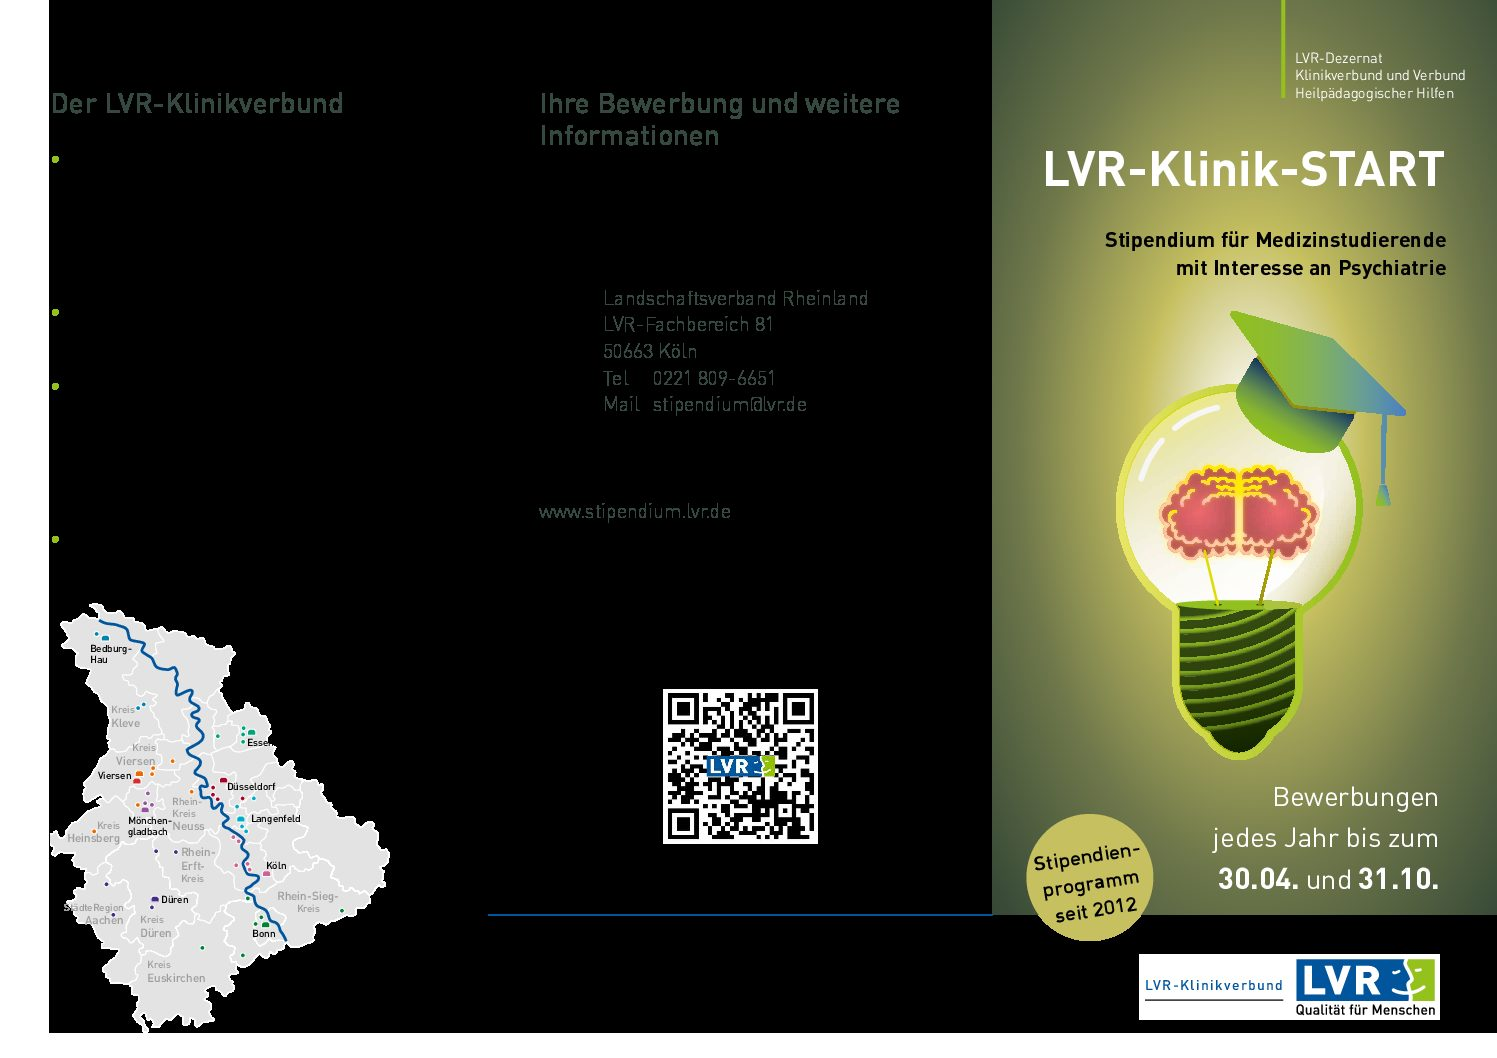 Flyer LVR-Klinik-START